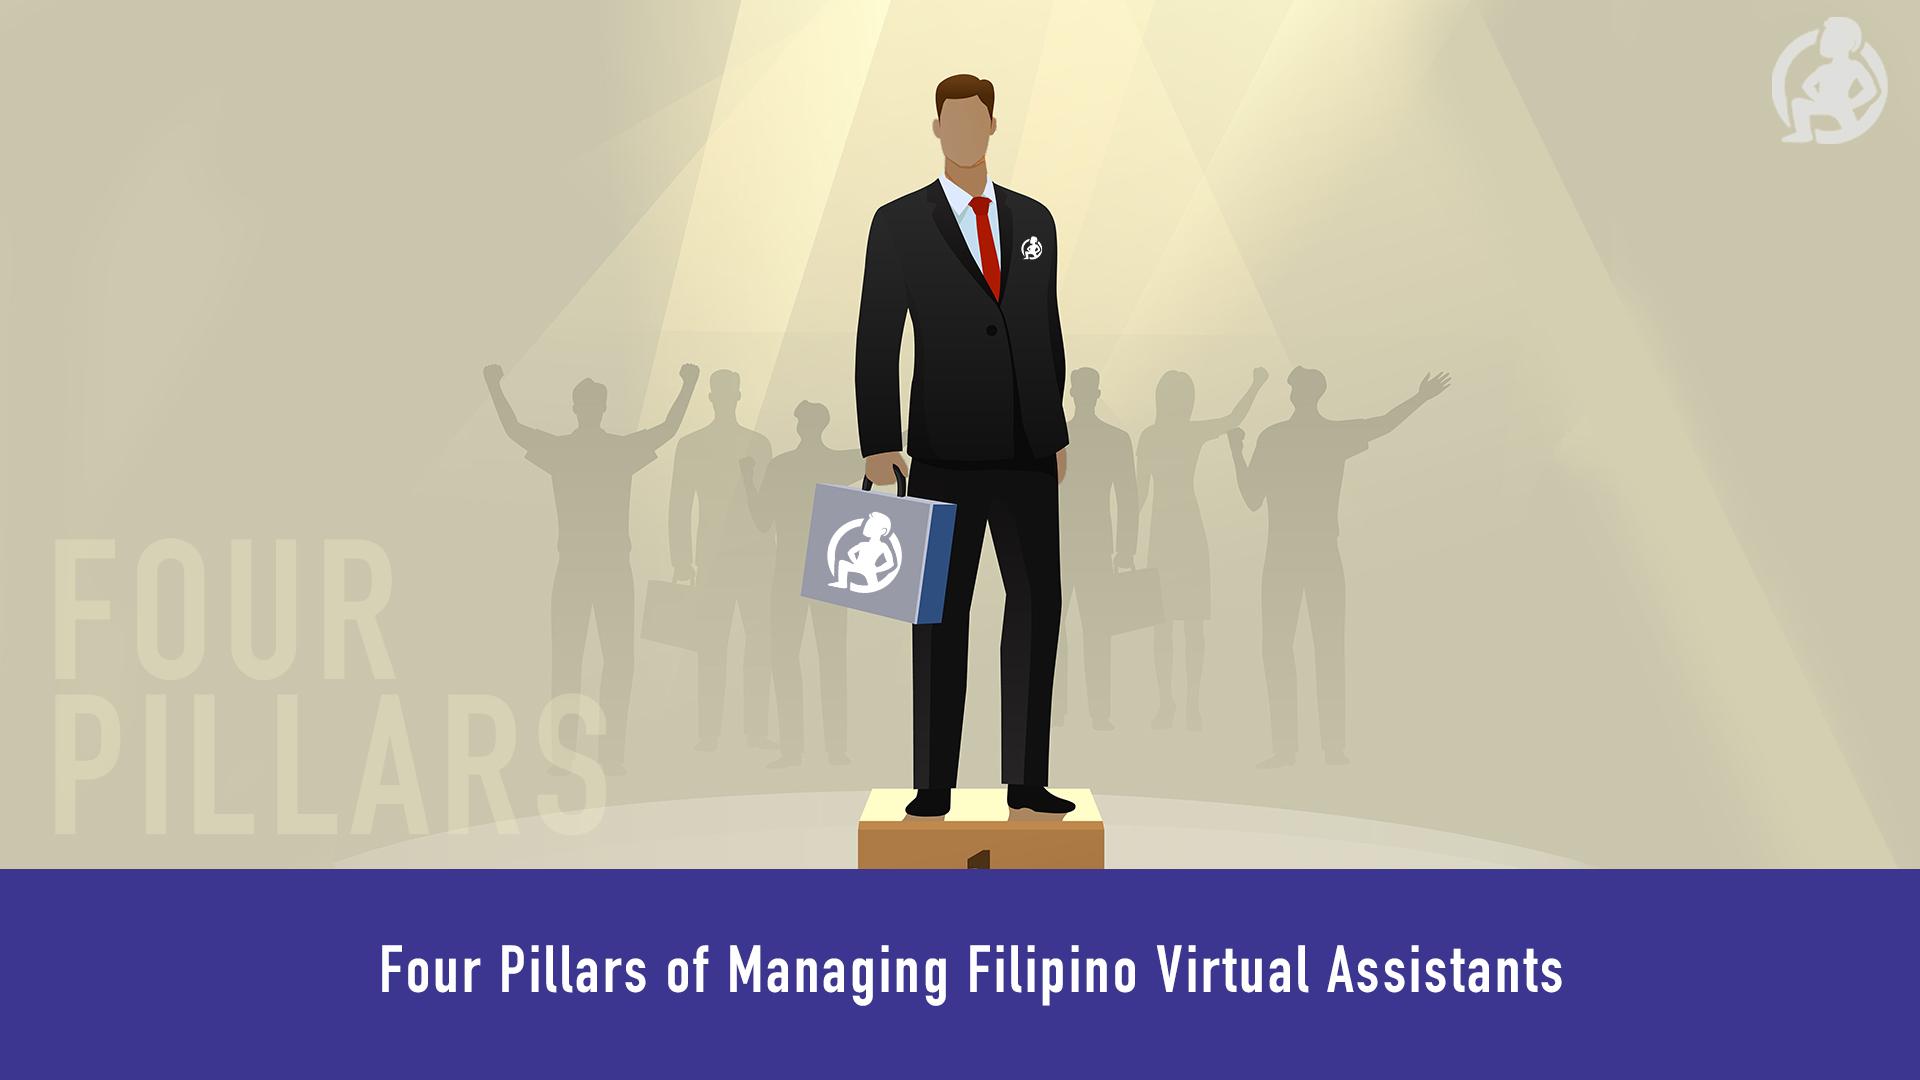 629 Four Pillars of Managing Filipino Virtual Assistants